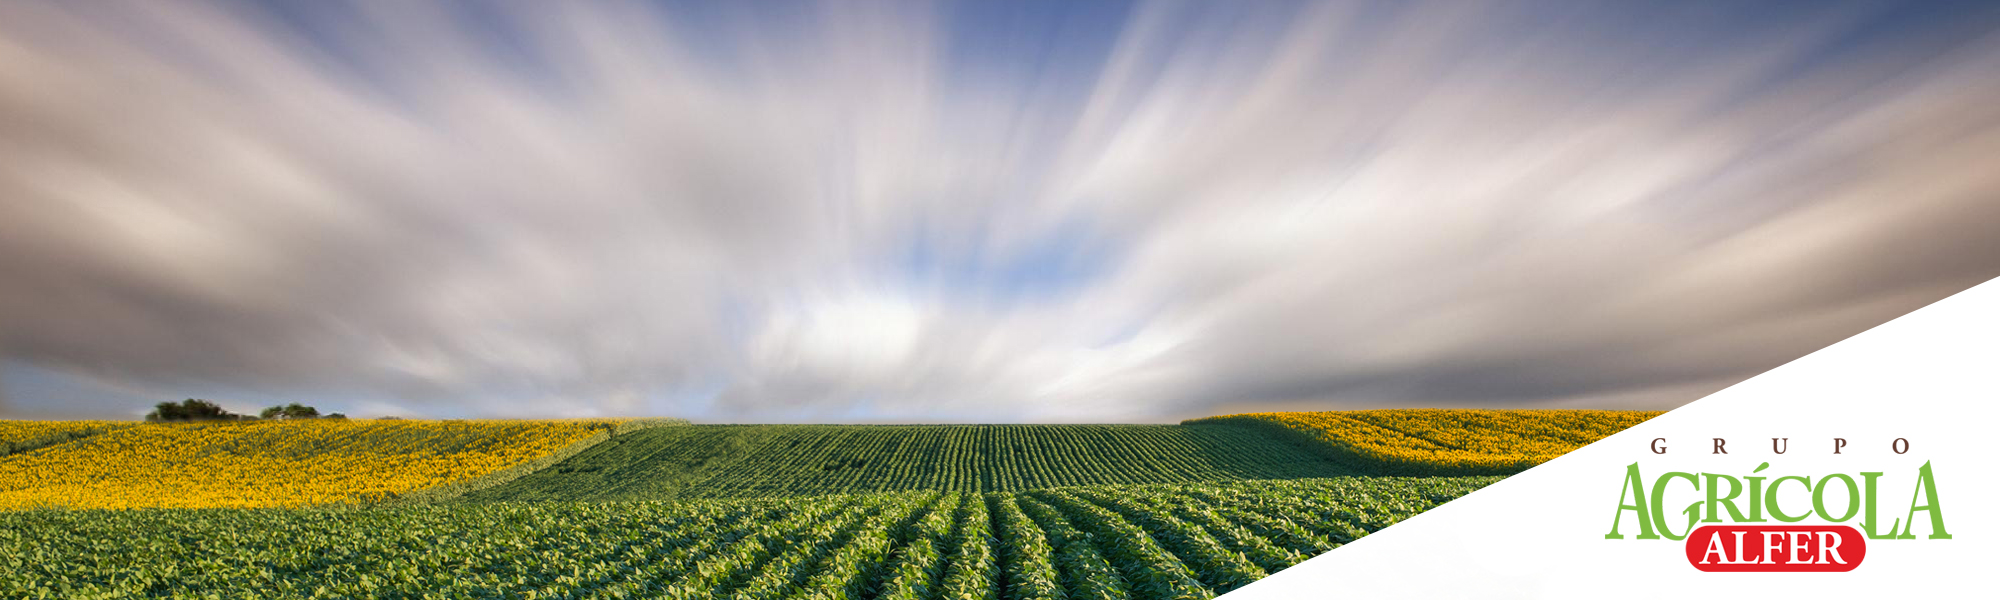 banner_agricola